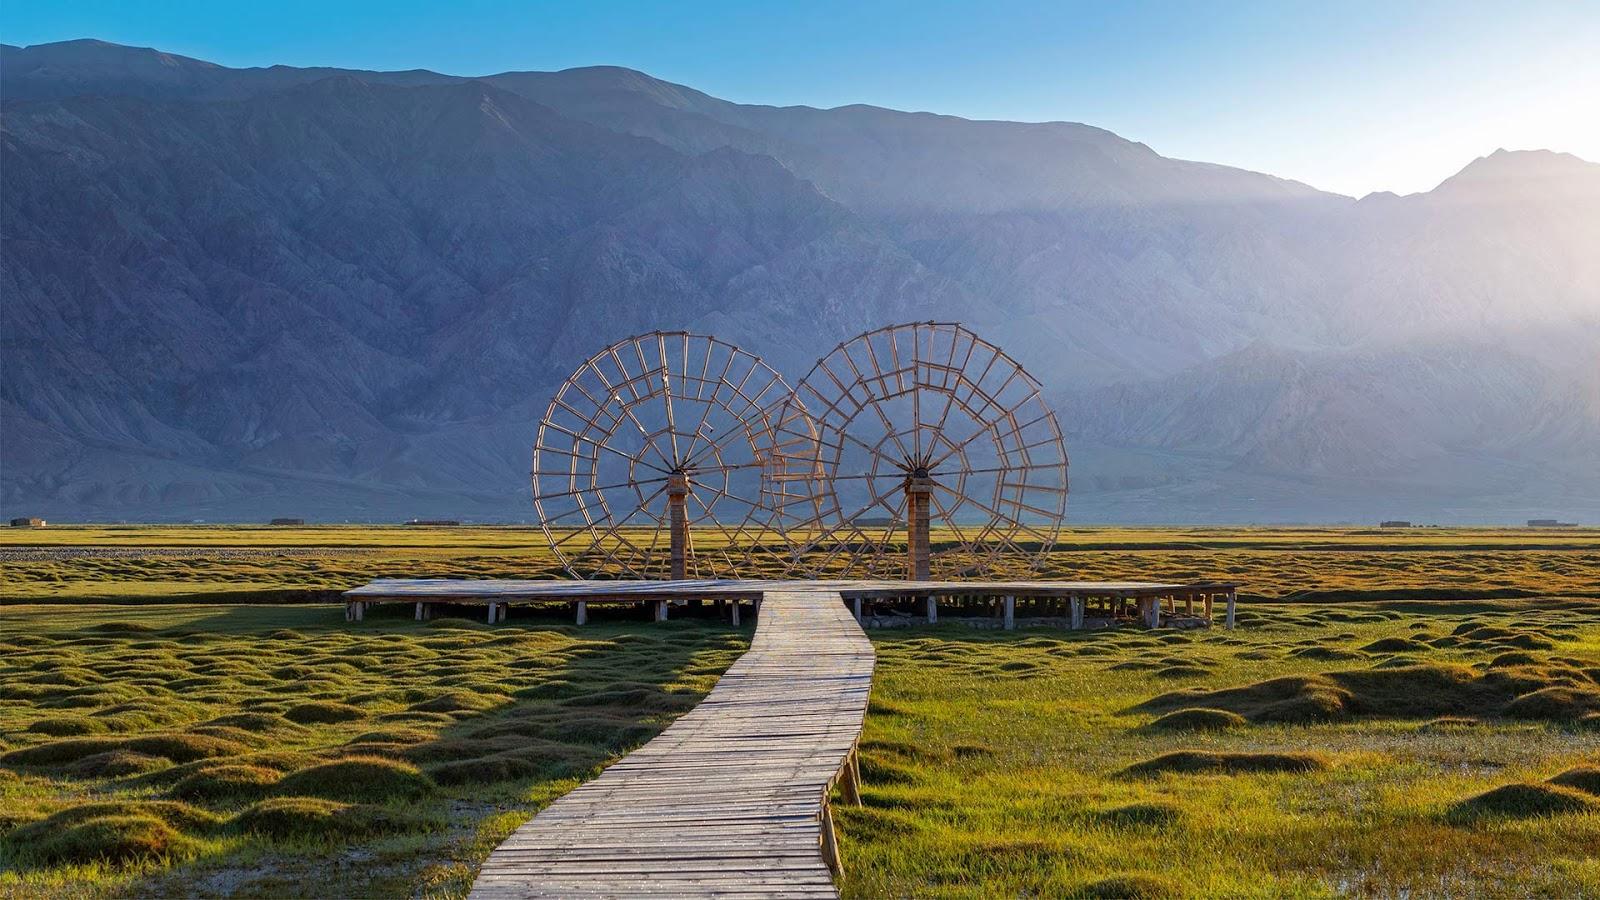 Water wheels in the Tashkurgan Grassland, Tashkurgan Tajik Autonomous County, Xinjiang, China © Ratnakorn Piyasirisorost/Getty Images